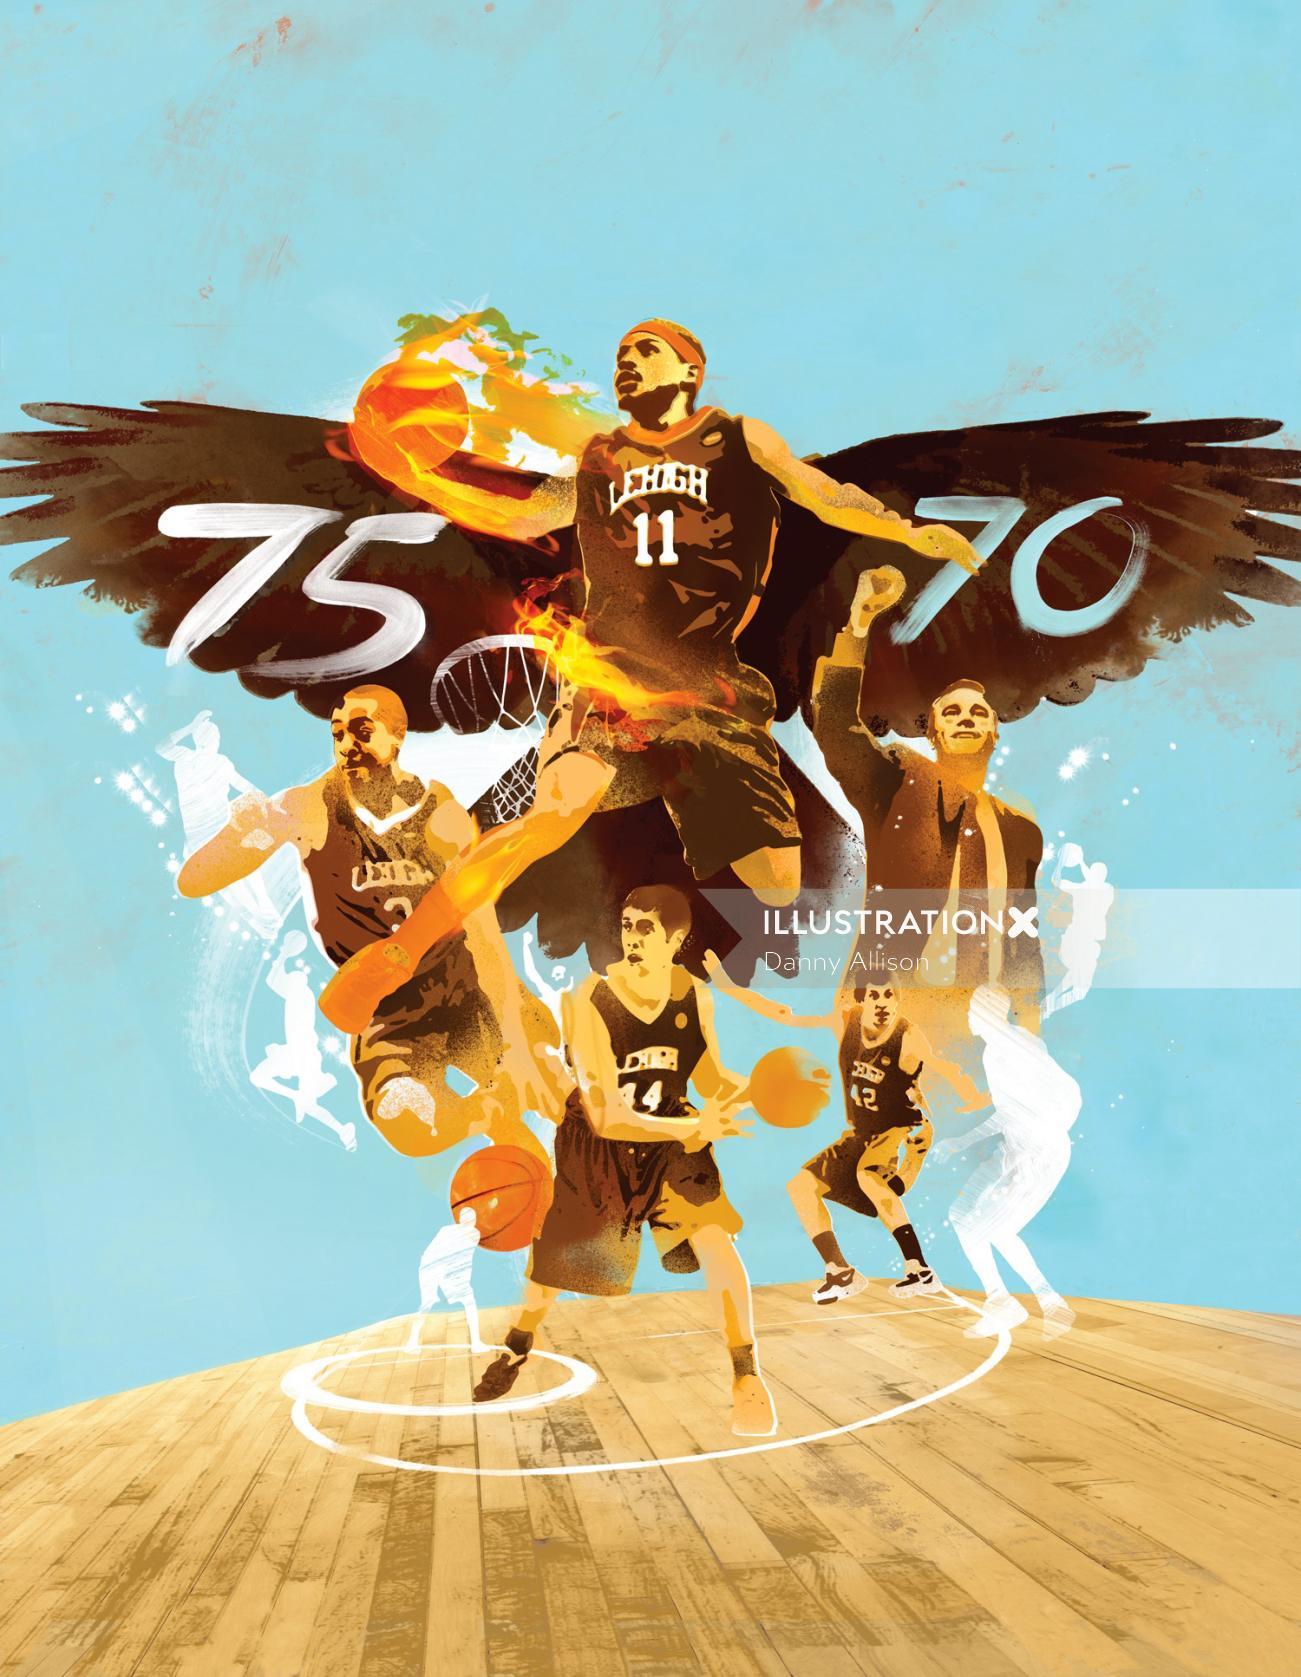 Editorial illustration for 2017 lehigh basketball team's year book